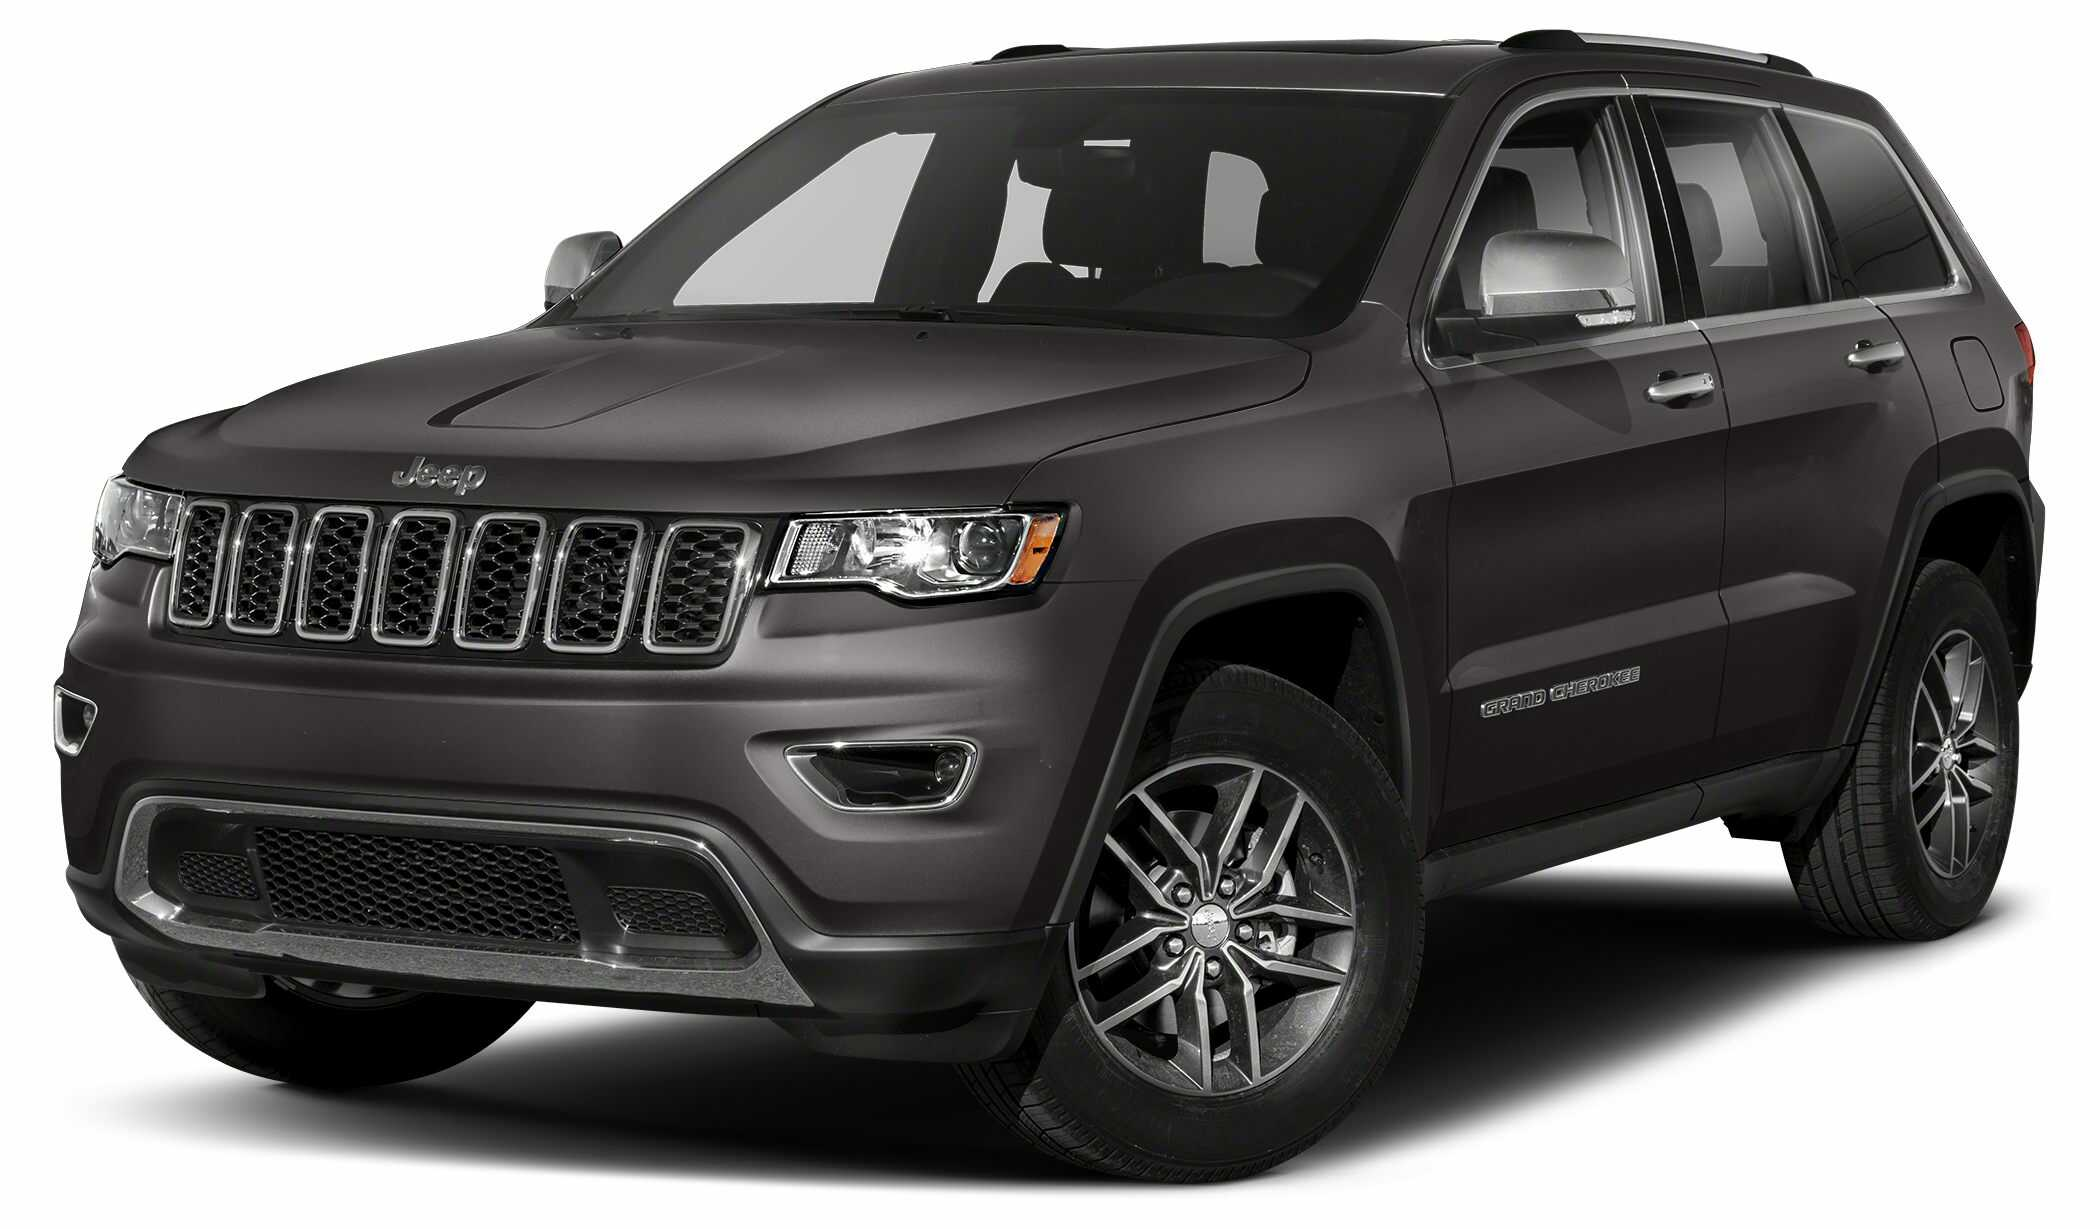 1C4RJFBG4MC594307 Jeep Patriot / Compass / Wrangler / Cherokee 2021